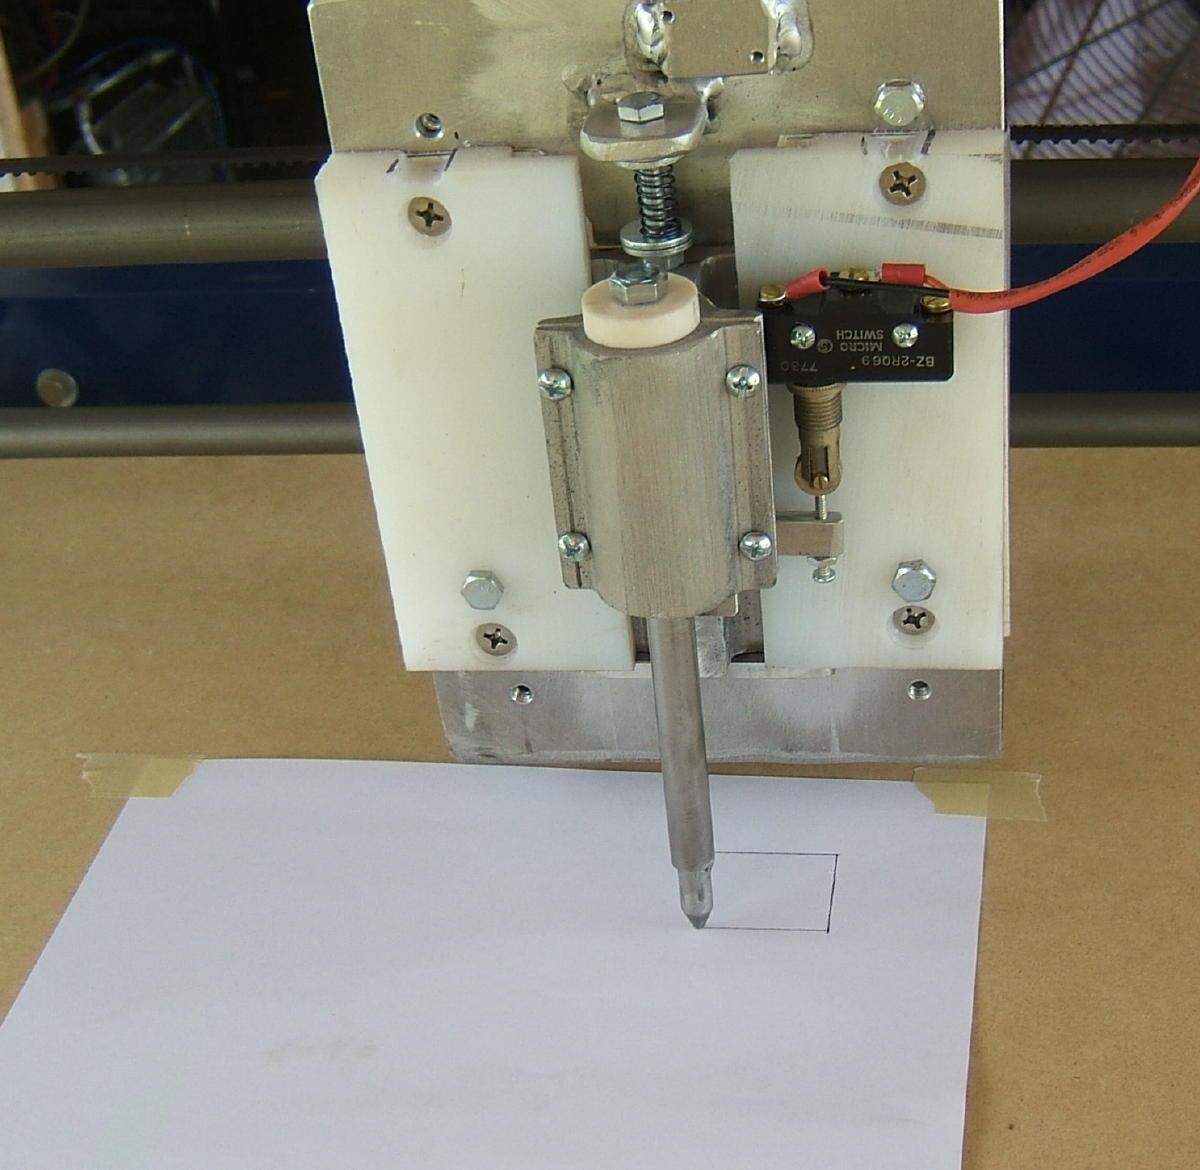 DIY cnc table plasma cutter